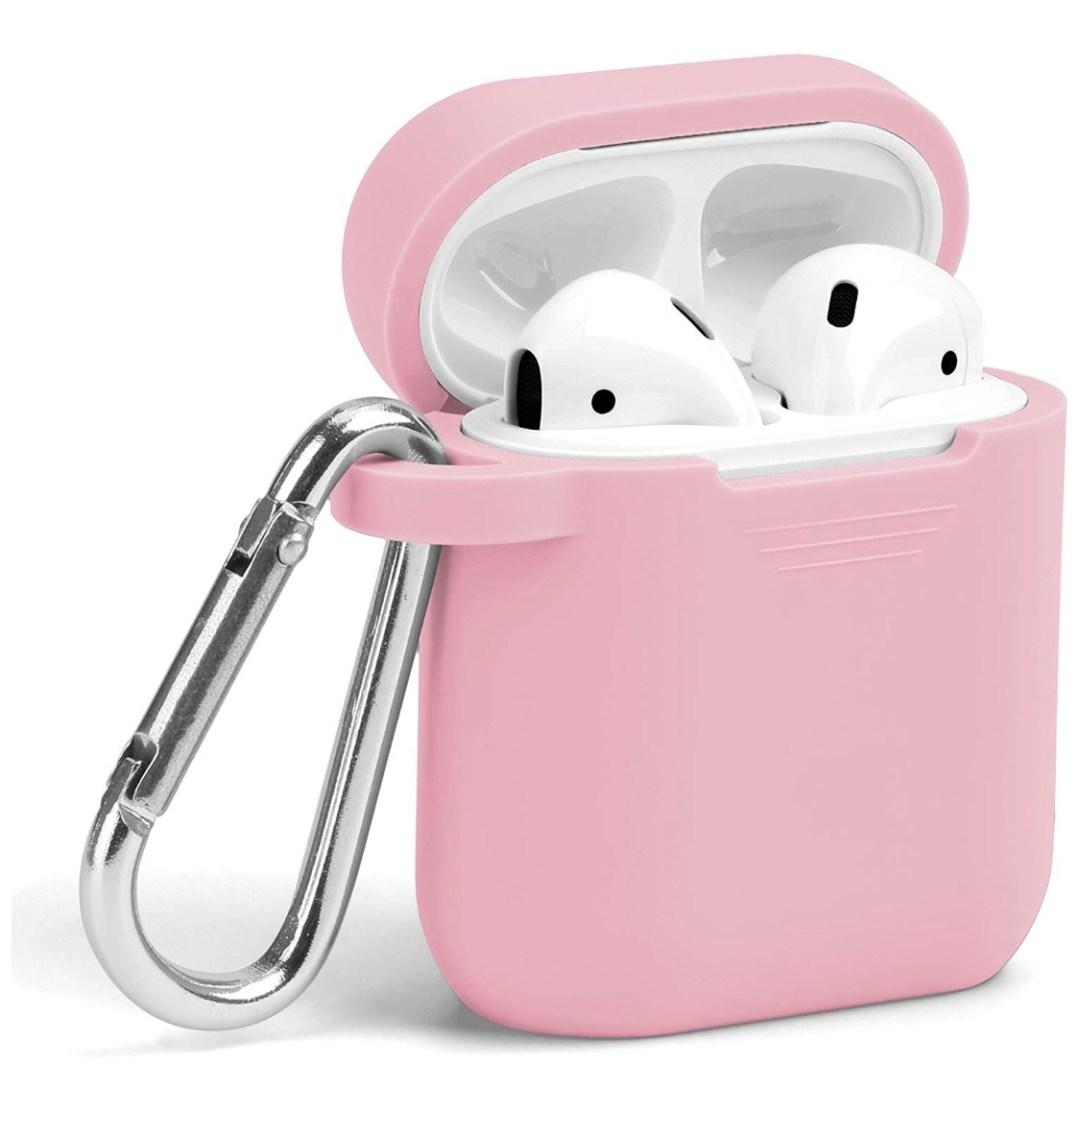 Cordless Headphones: Apple AirPods